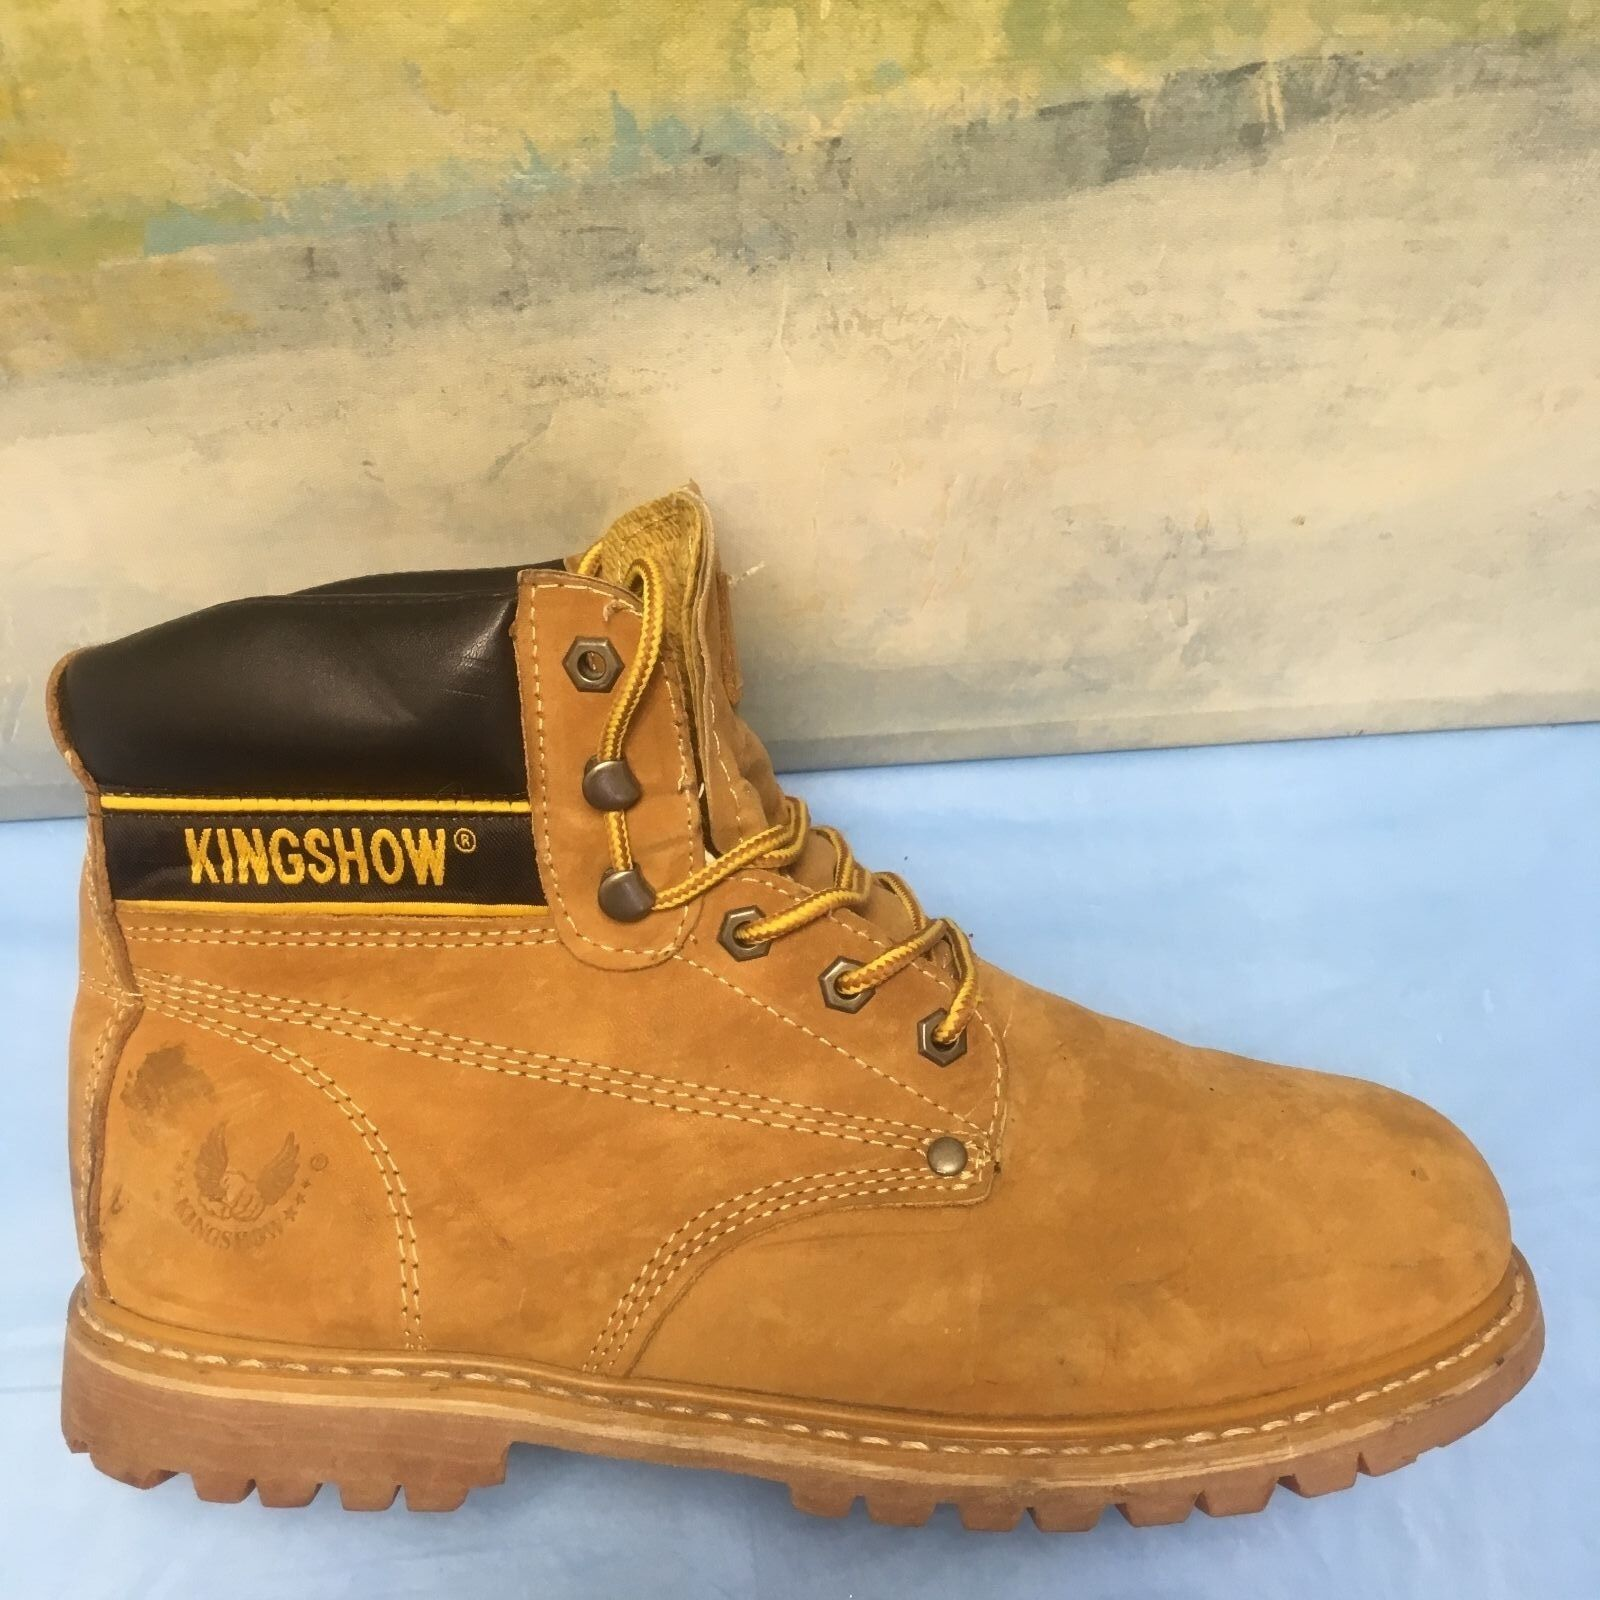 KINGSHOW 8036 Men's Classical Boots Wheat 12 D(M) US